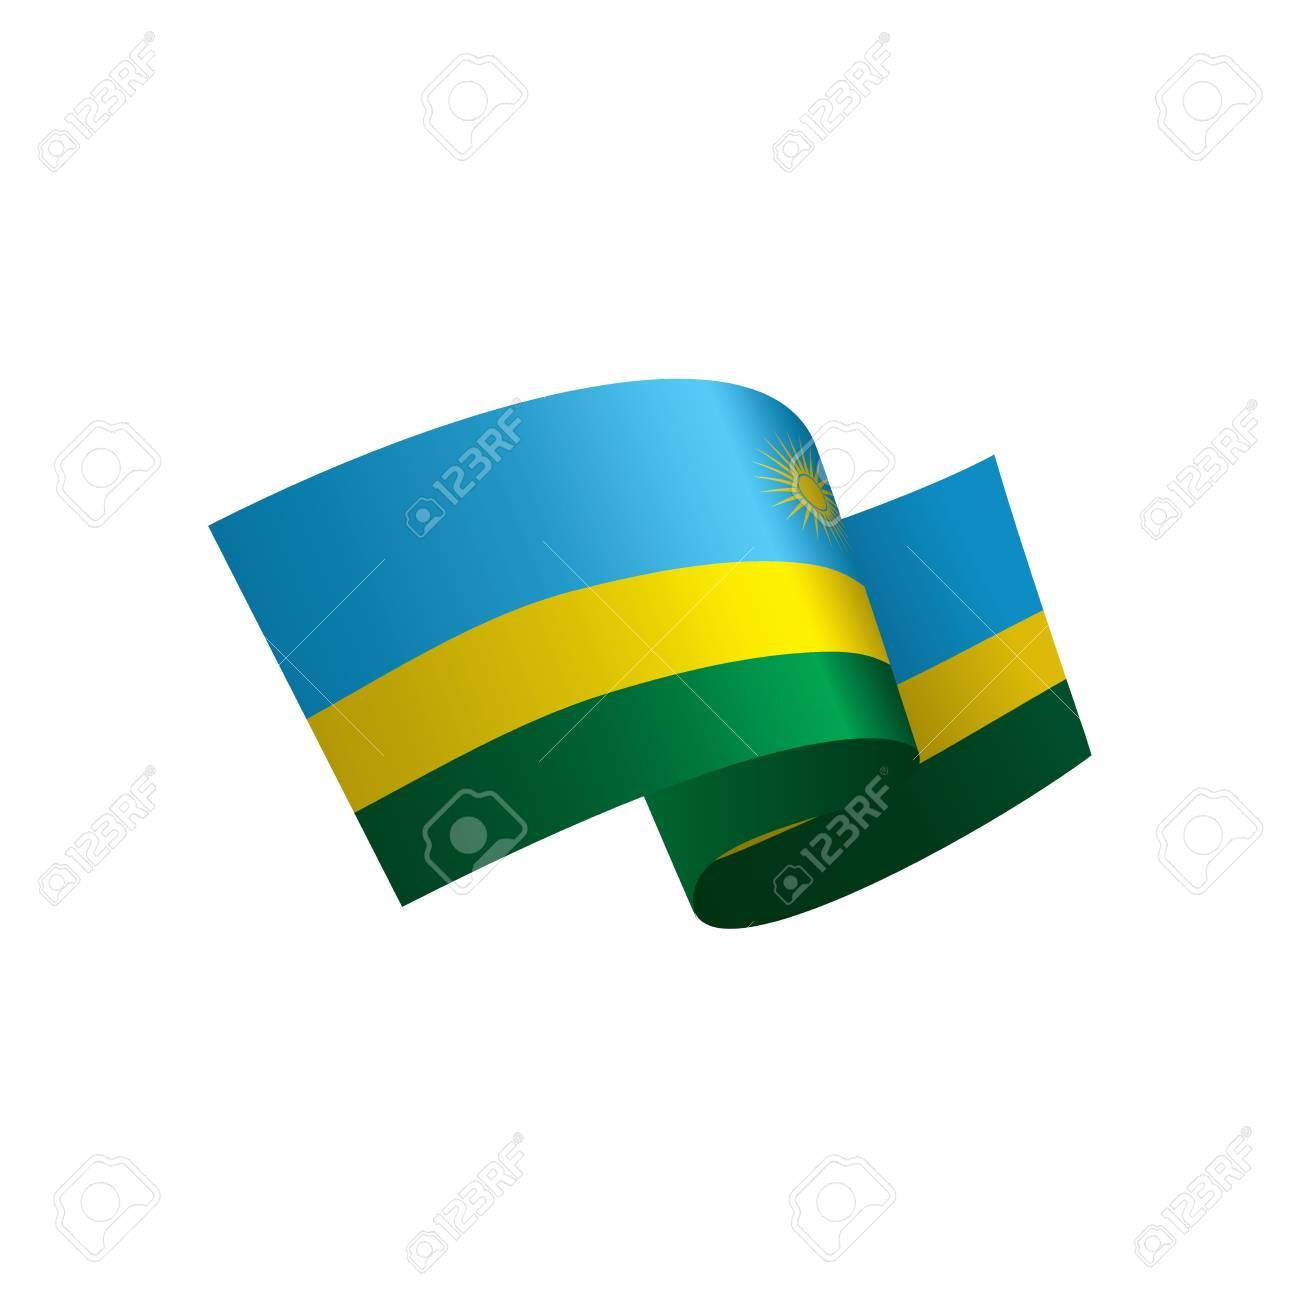 Rwanda Flag Vector Illustration On A White Background Royalty - Rwanda flag